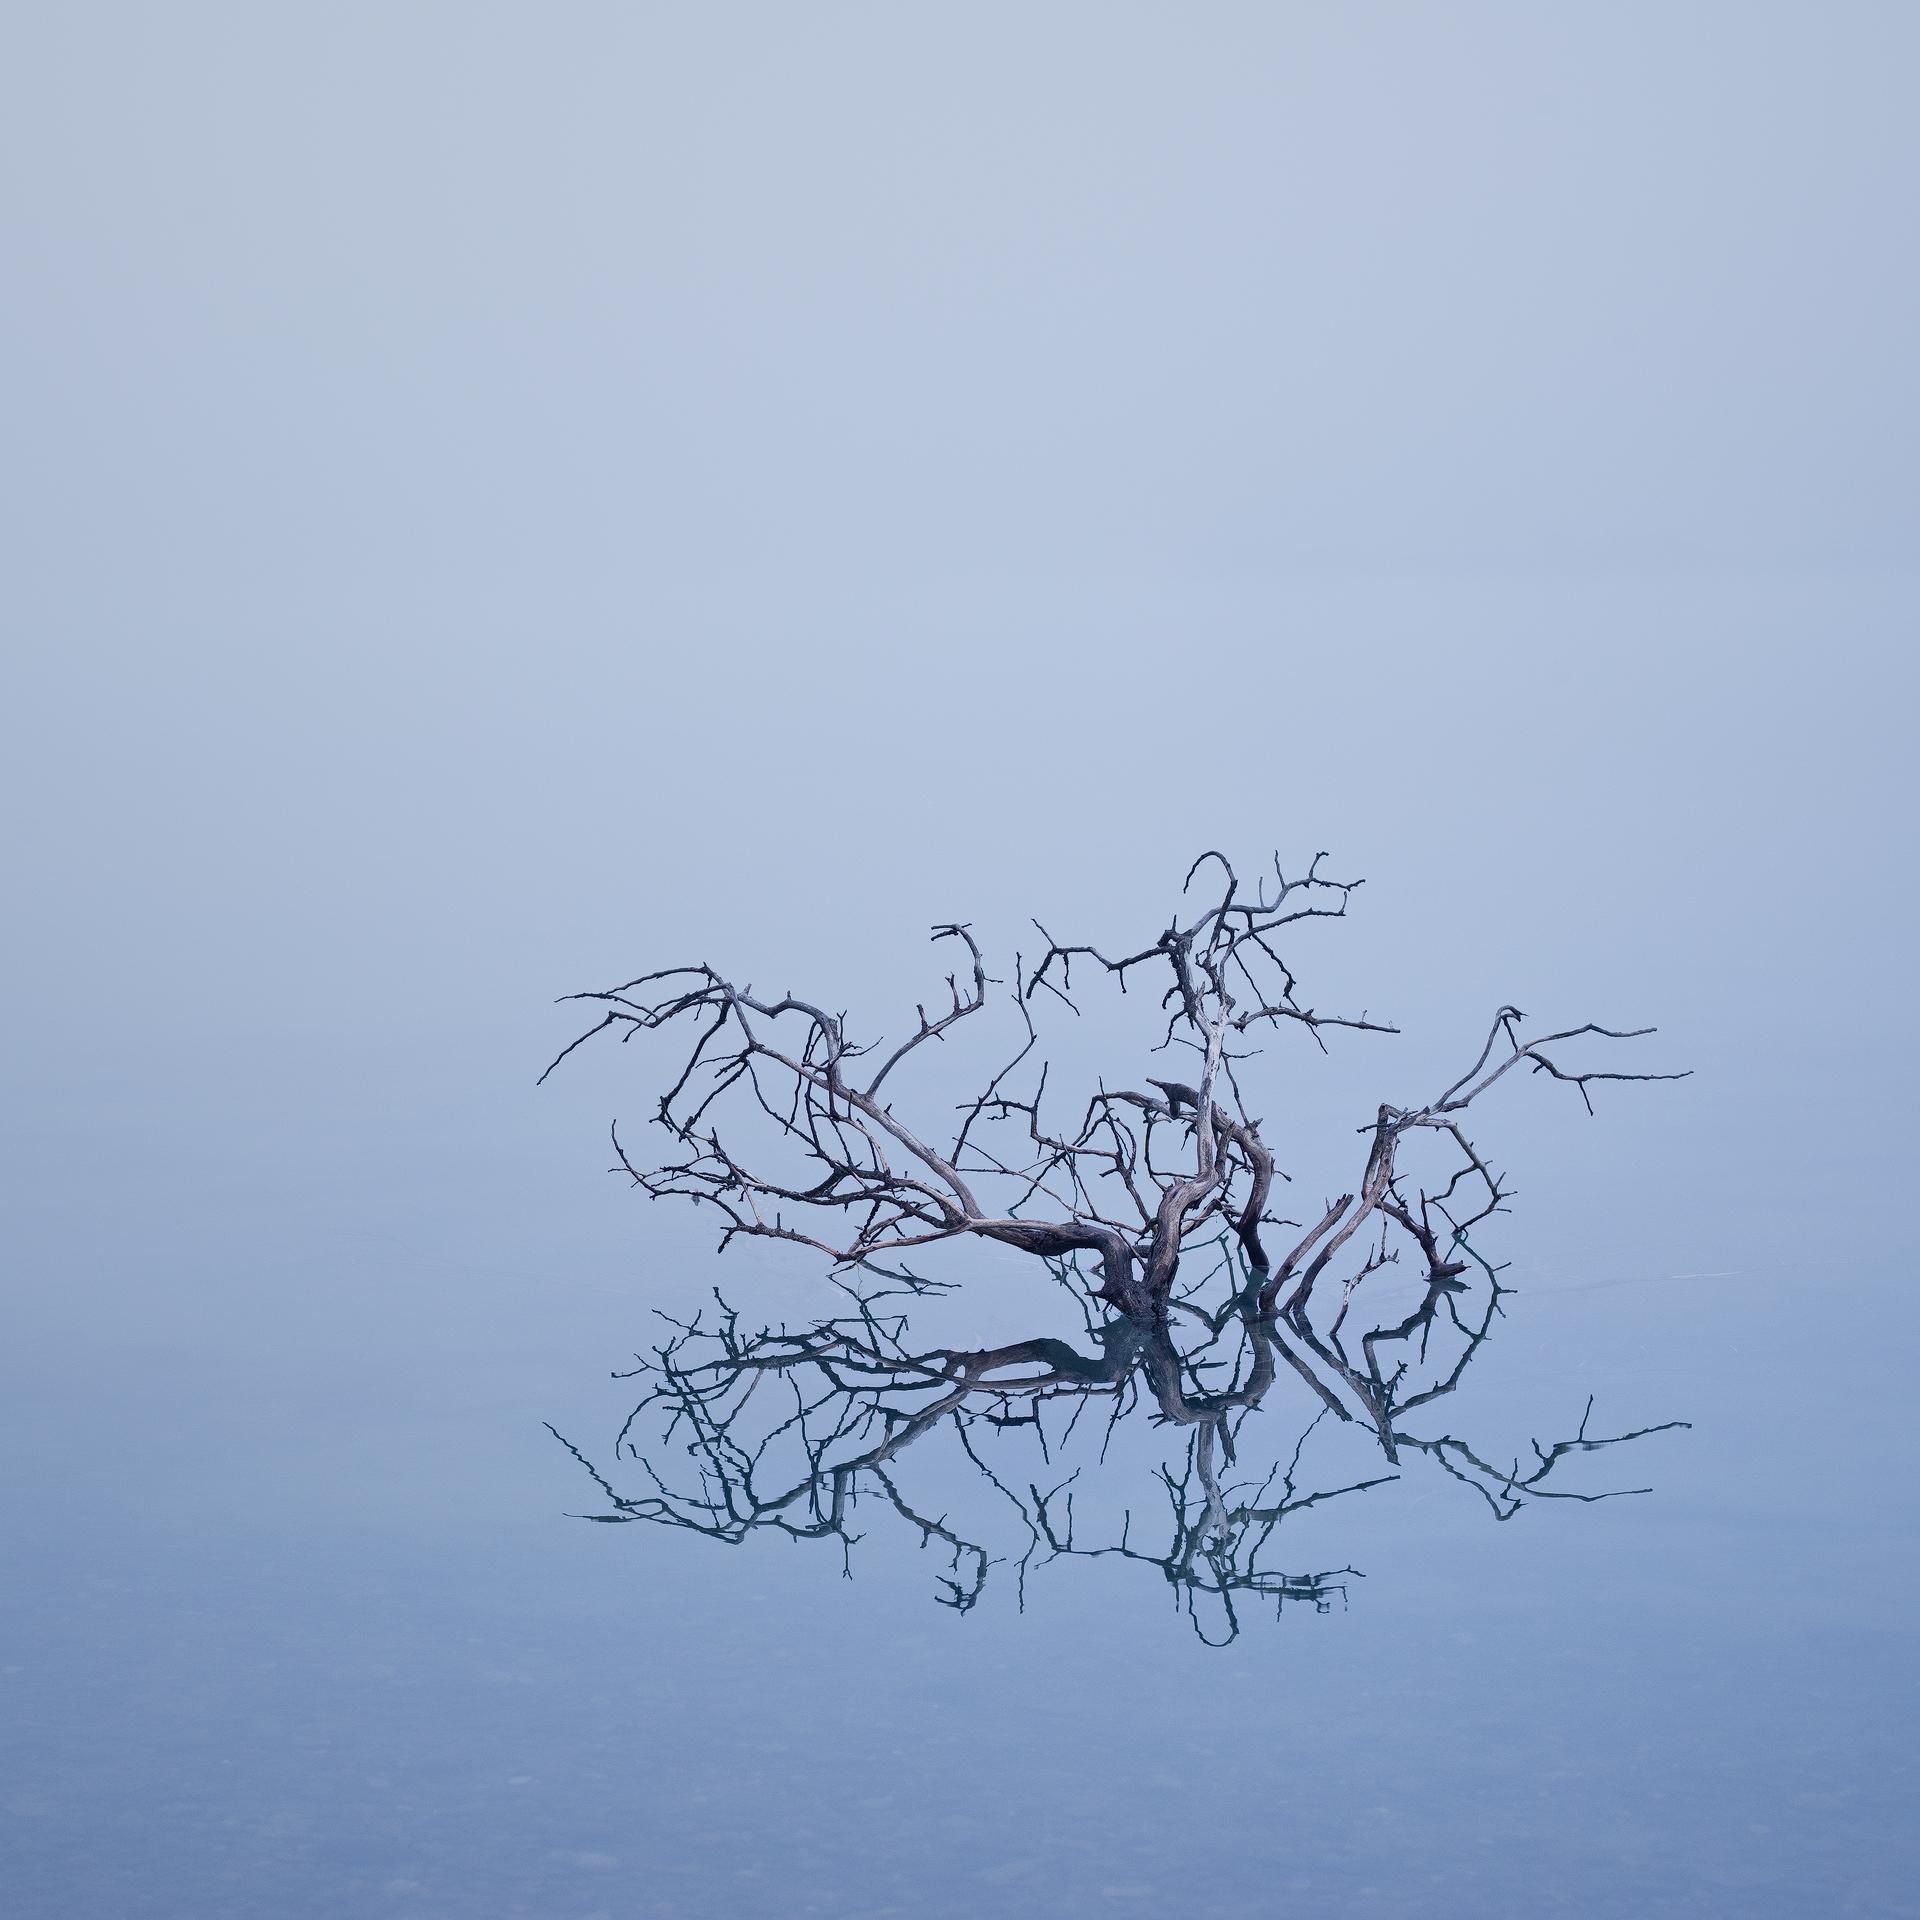 Tree study#3- Lake Pehoe, Torres del Paine, Patagonia